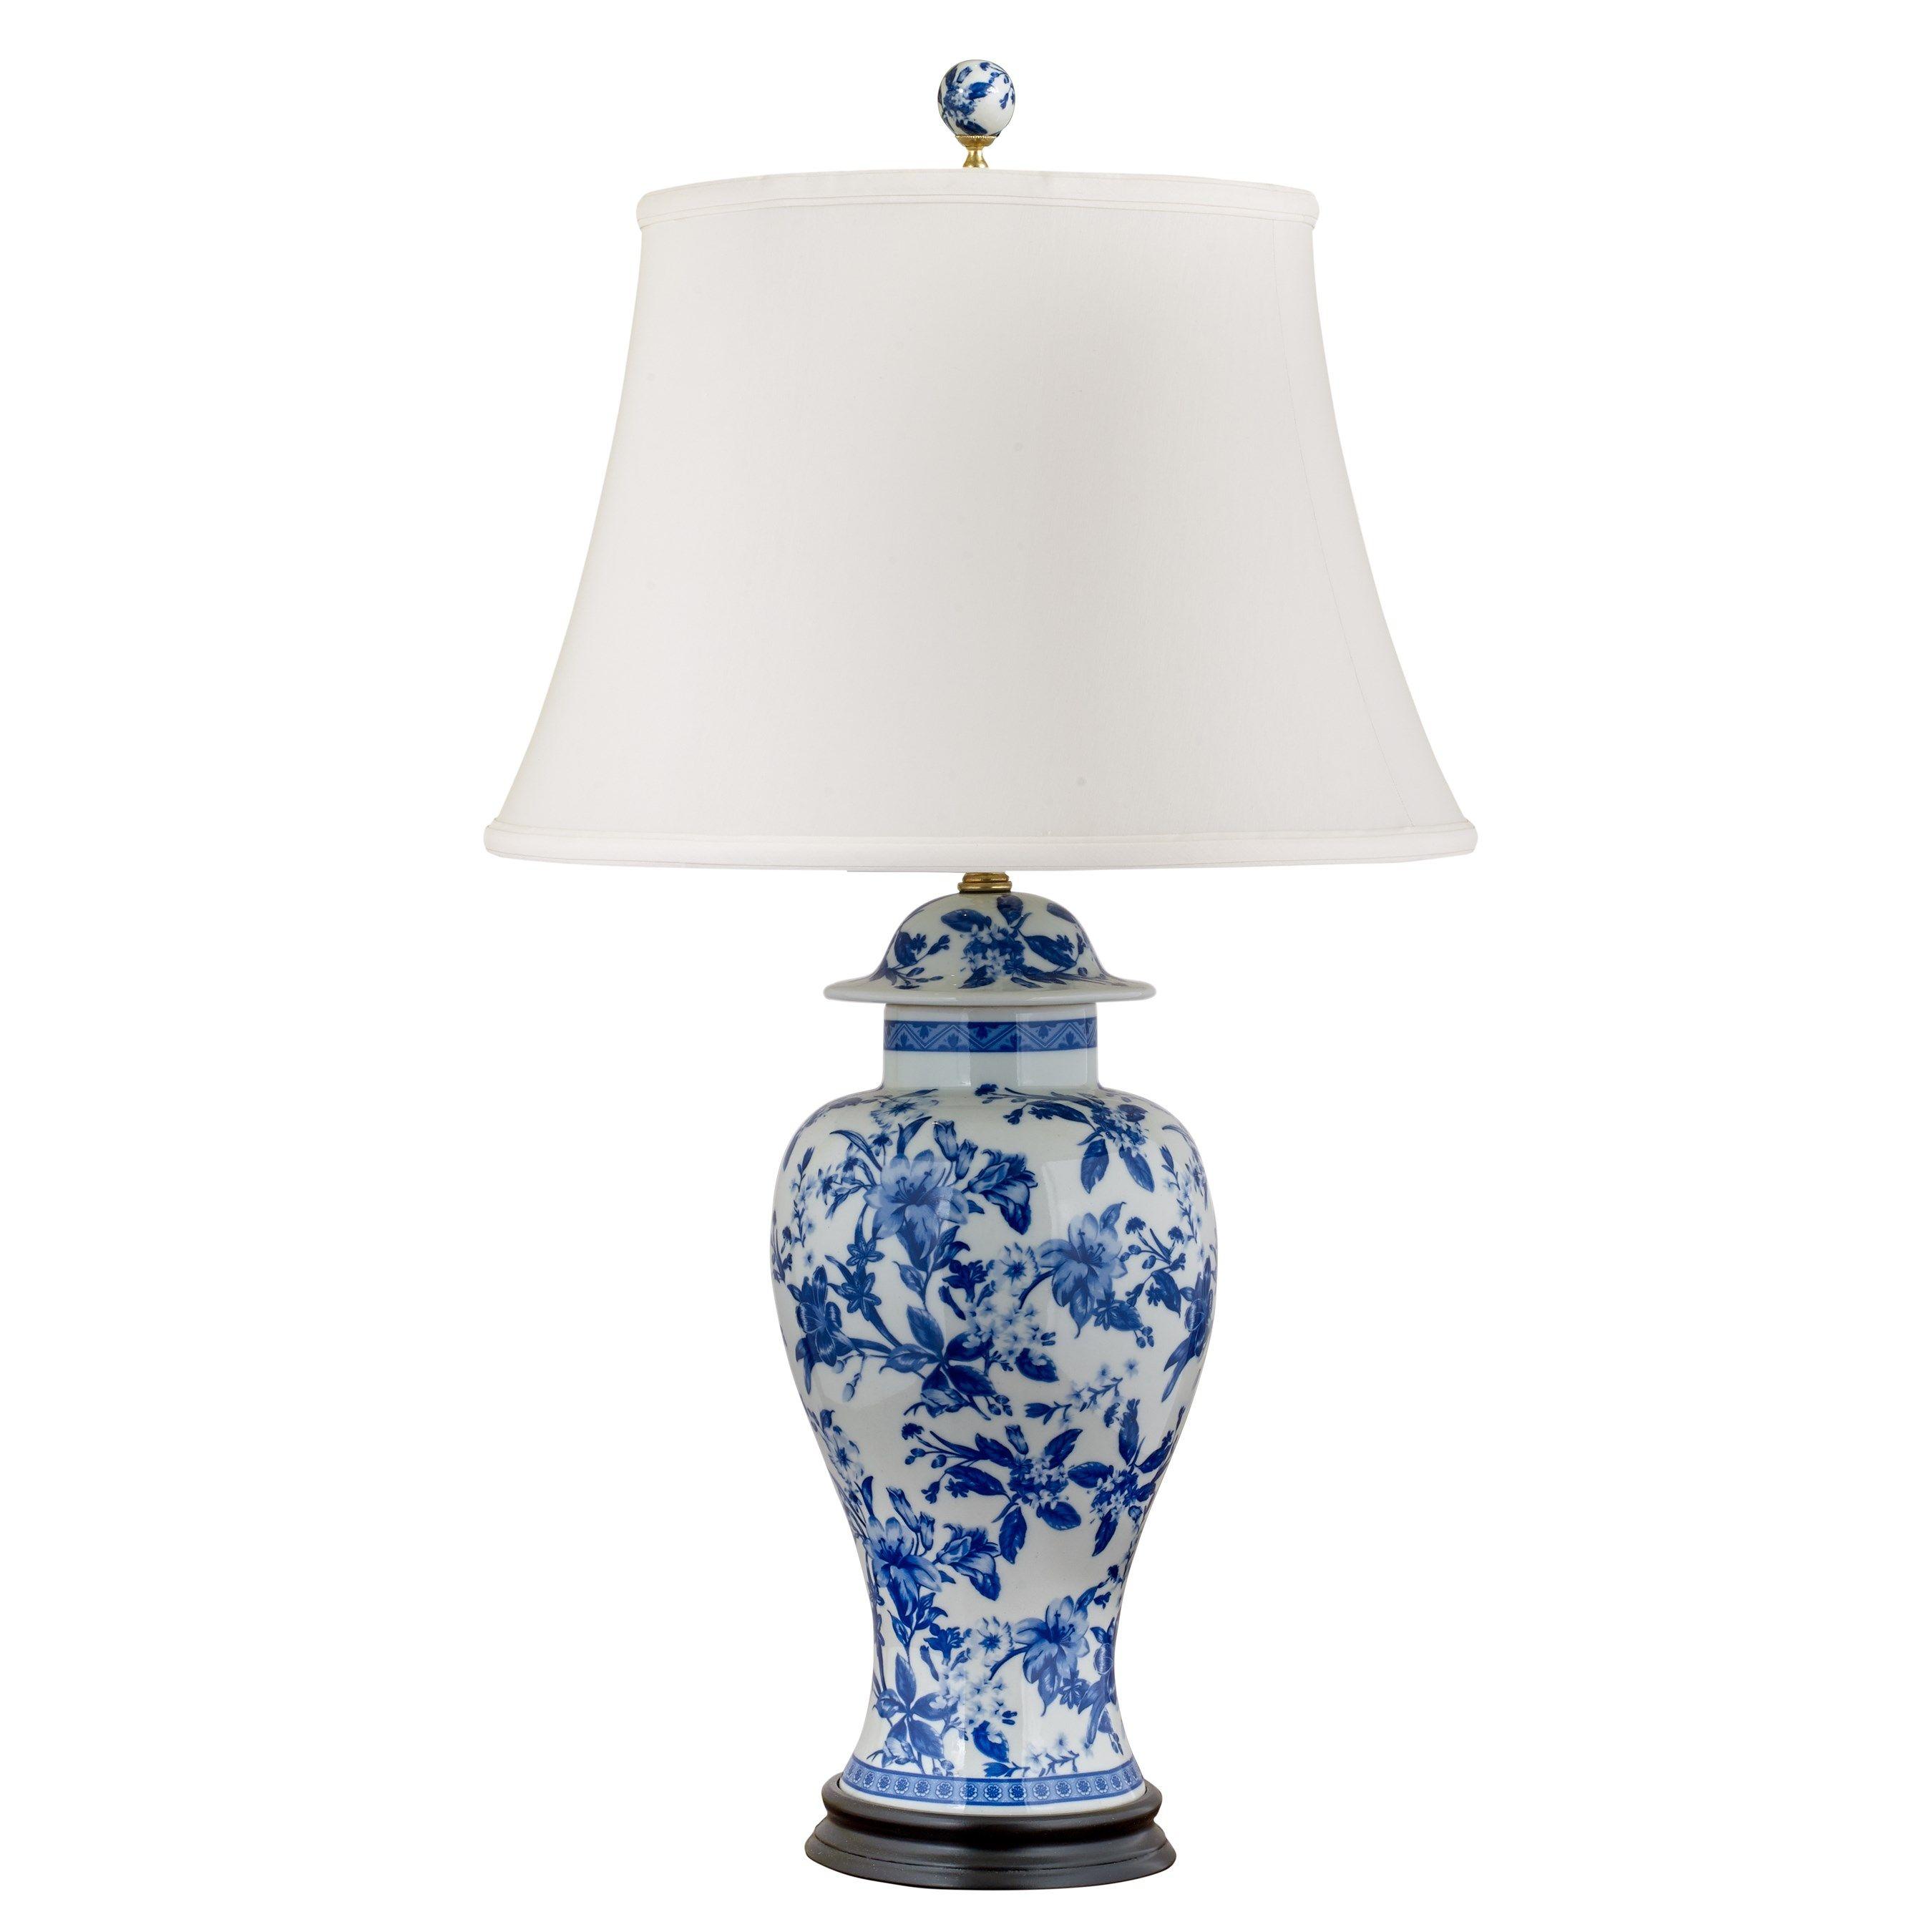 Cannon Global Blue Dragon Motif Porcelain Lucite Table Lamp Lamp Table Lamp White Table Lamp